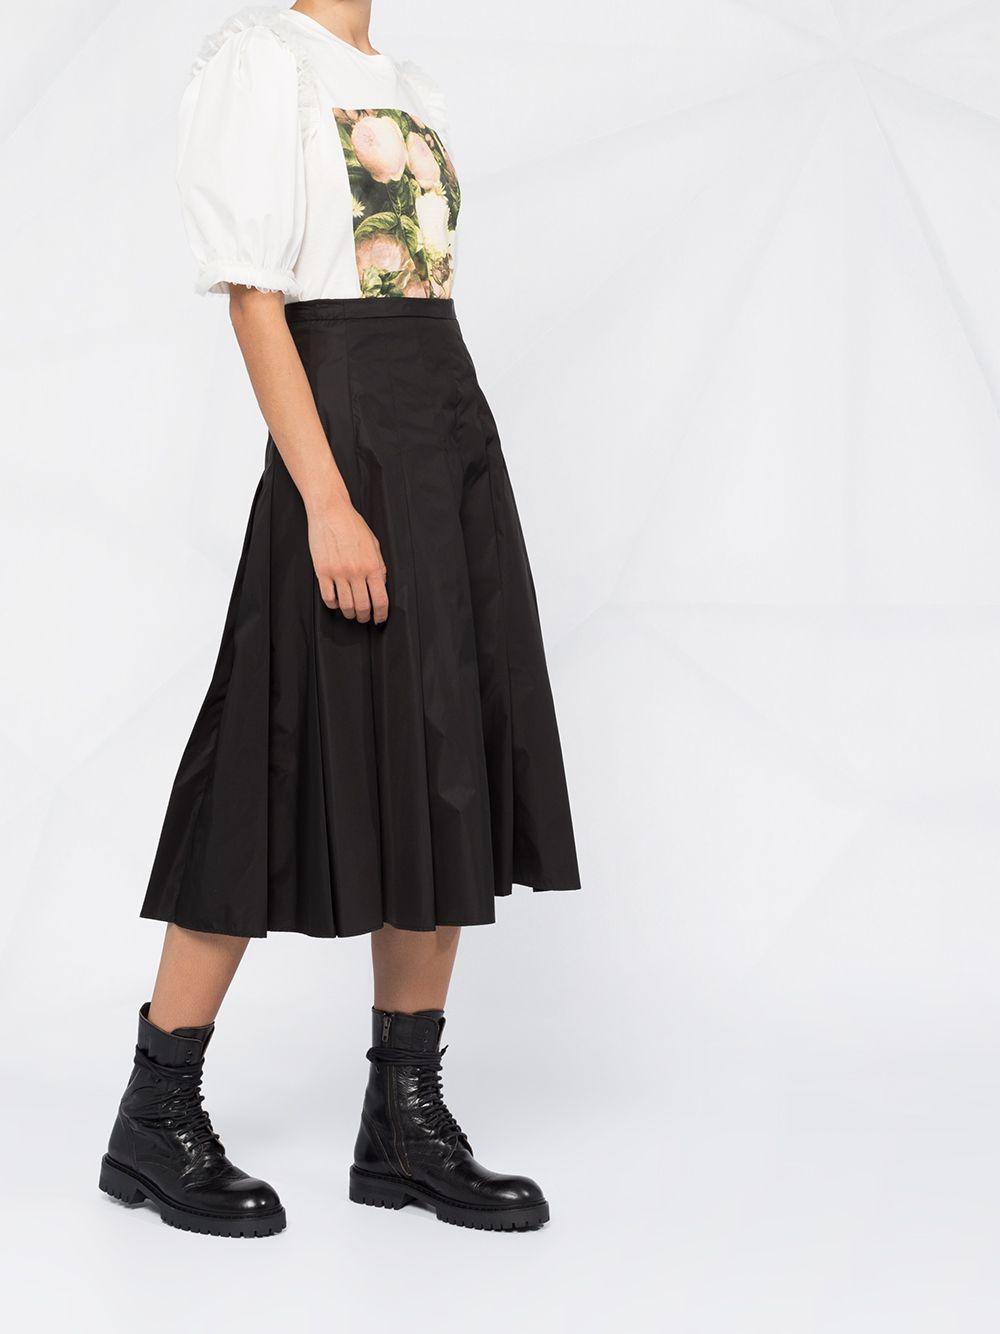 black nylon pleated midi skirt MONCLER      2D712-00-C0068999